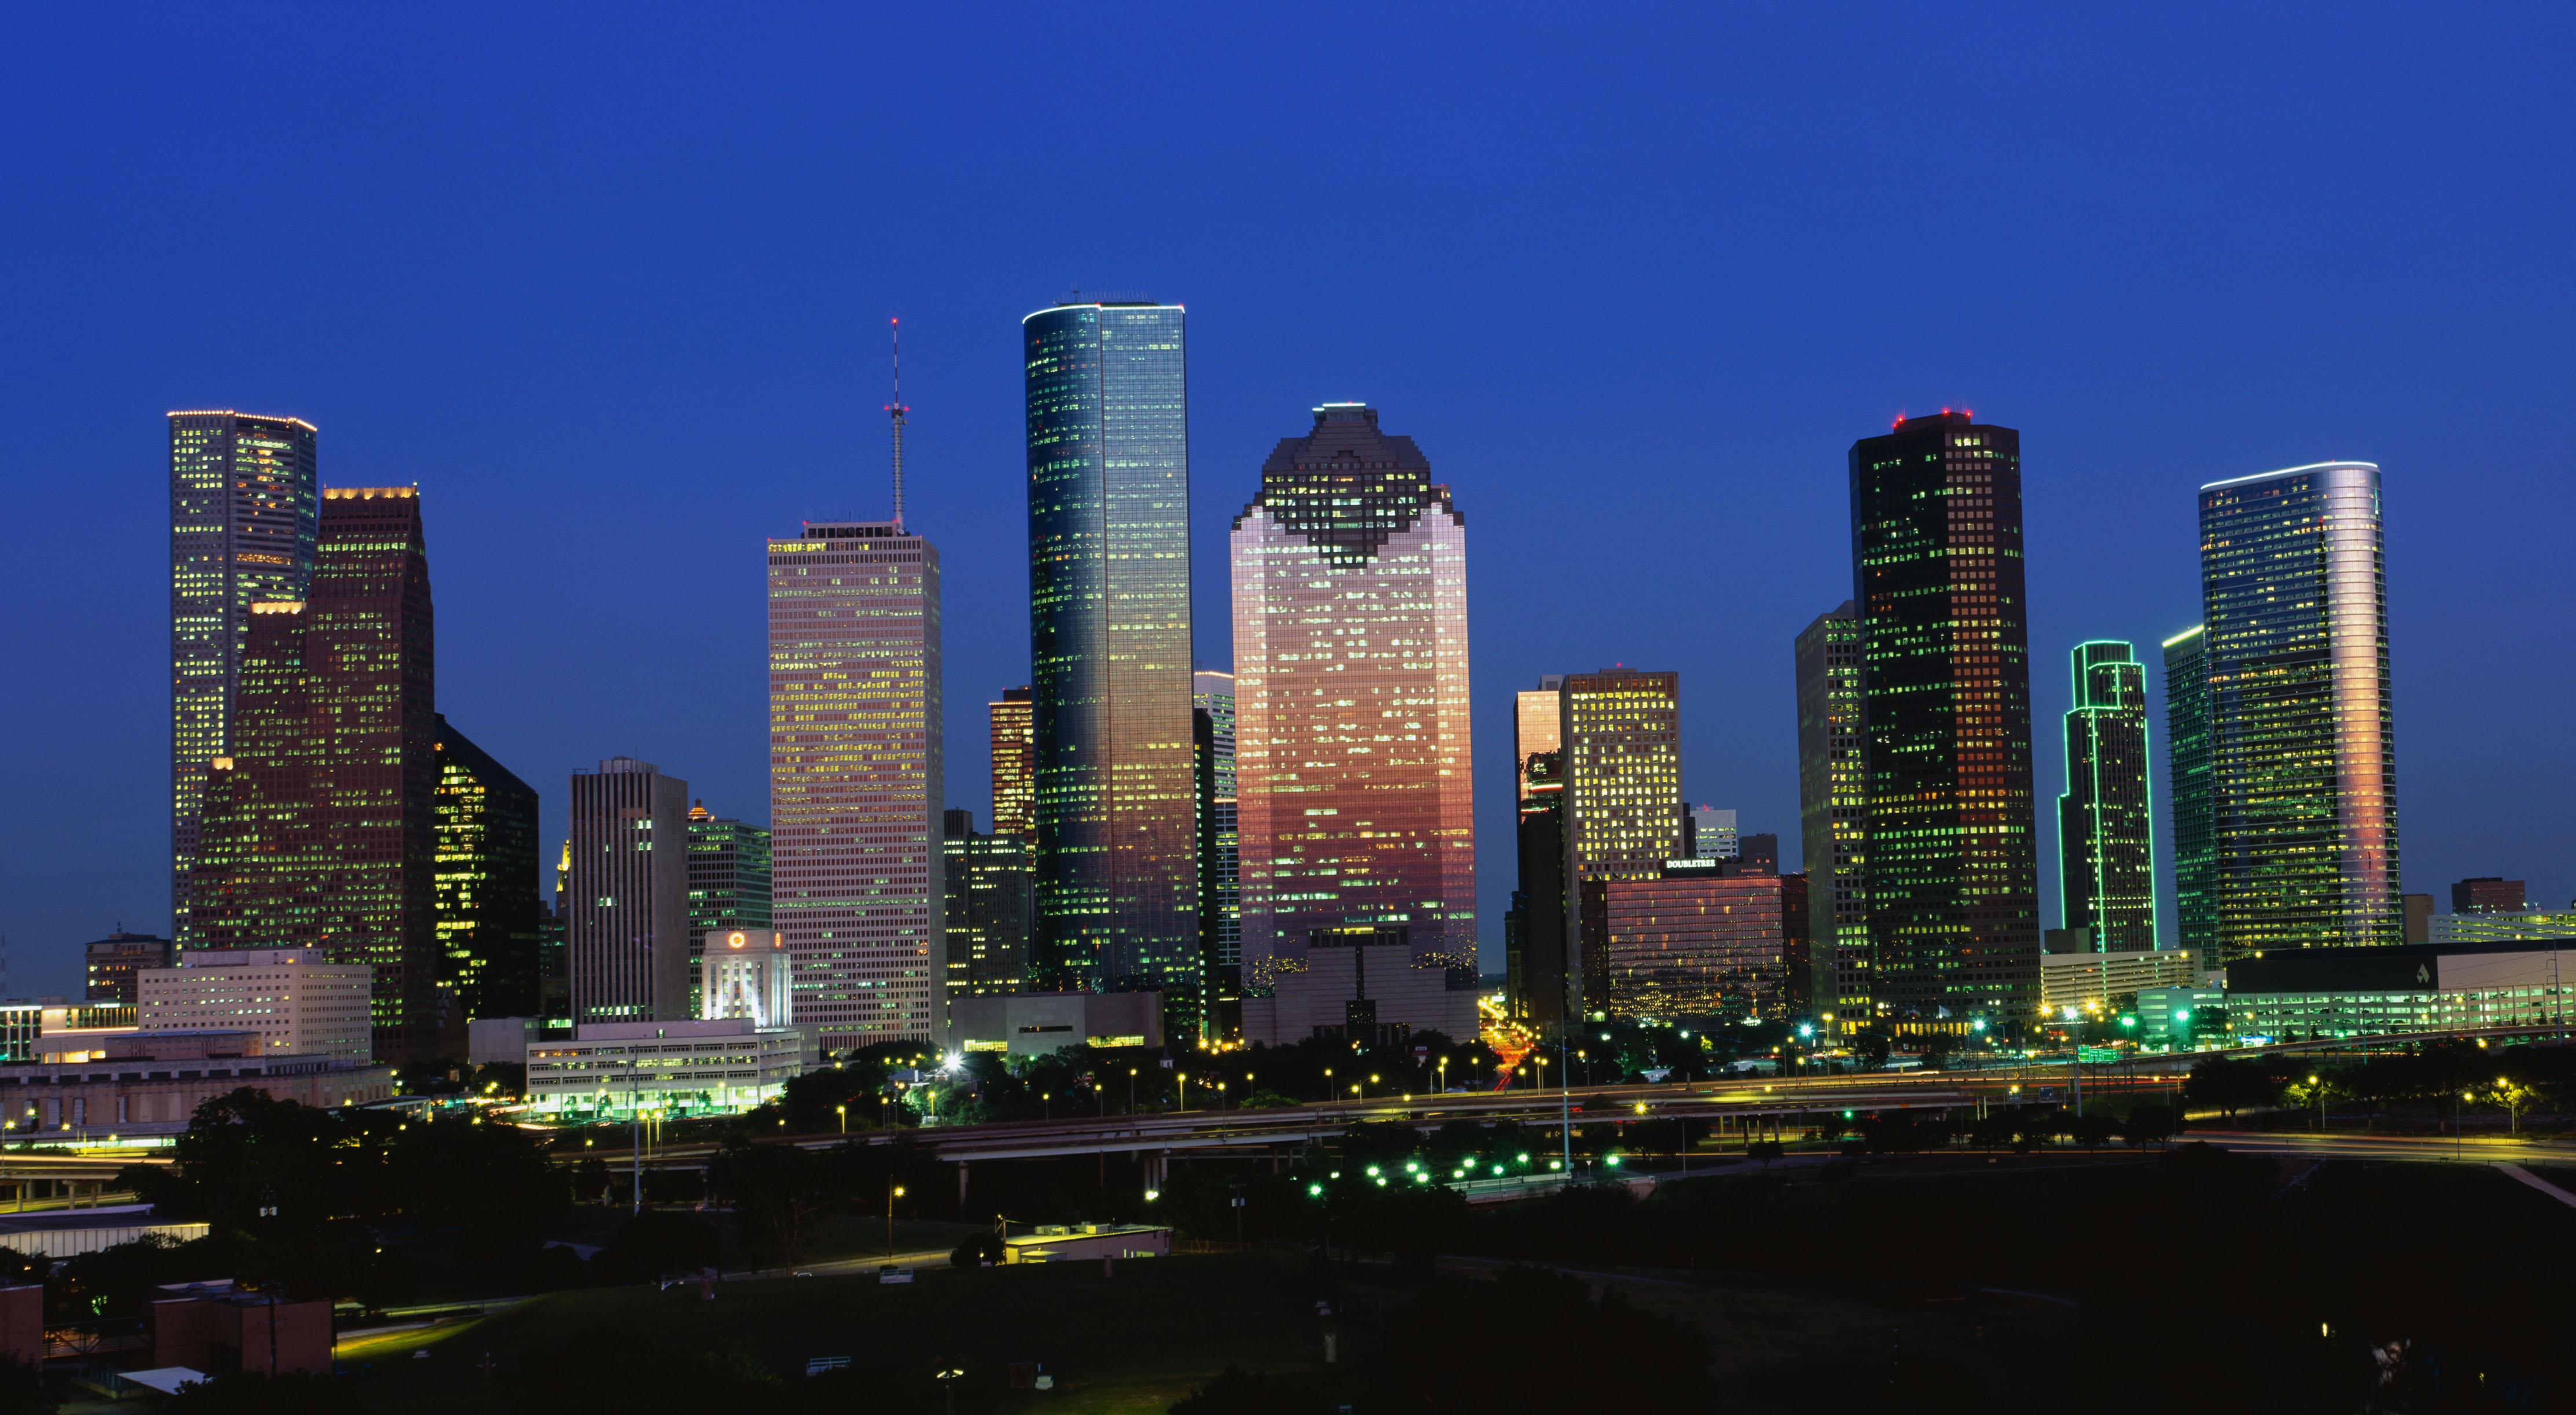 Houston Texas HOA Management services